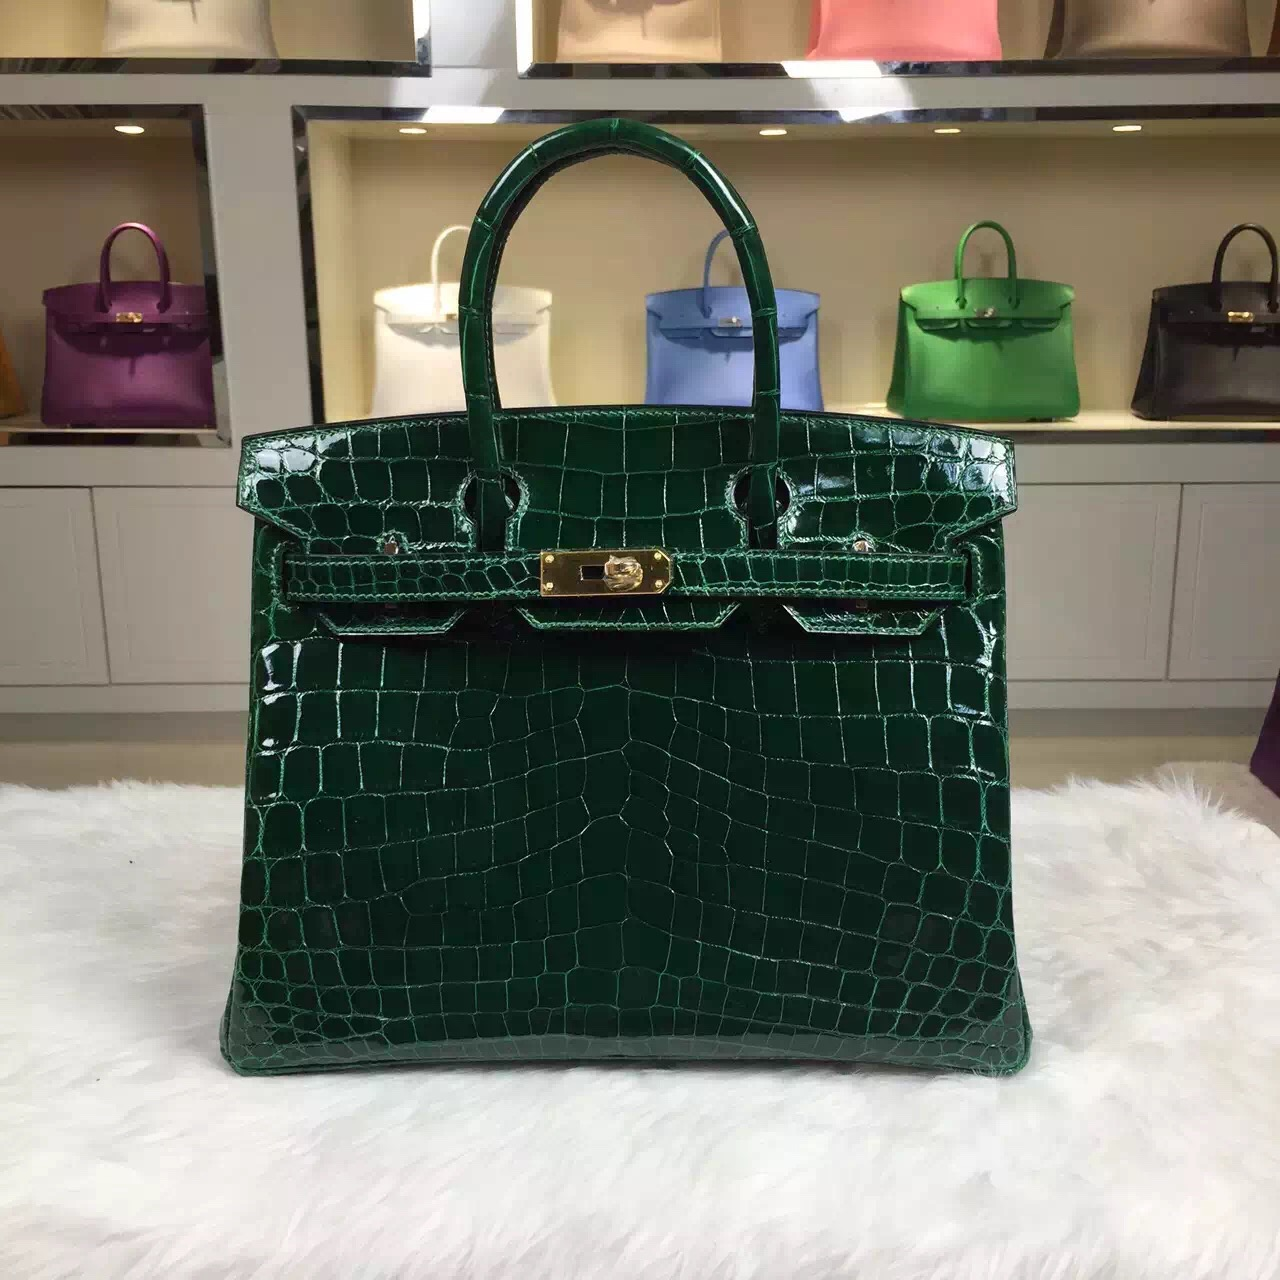 Hand Stitching Hermes Birkin30CM CK67 Emerald Green HCP Crocodile Leather Women's Handbag